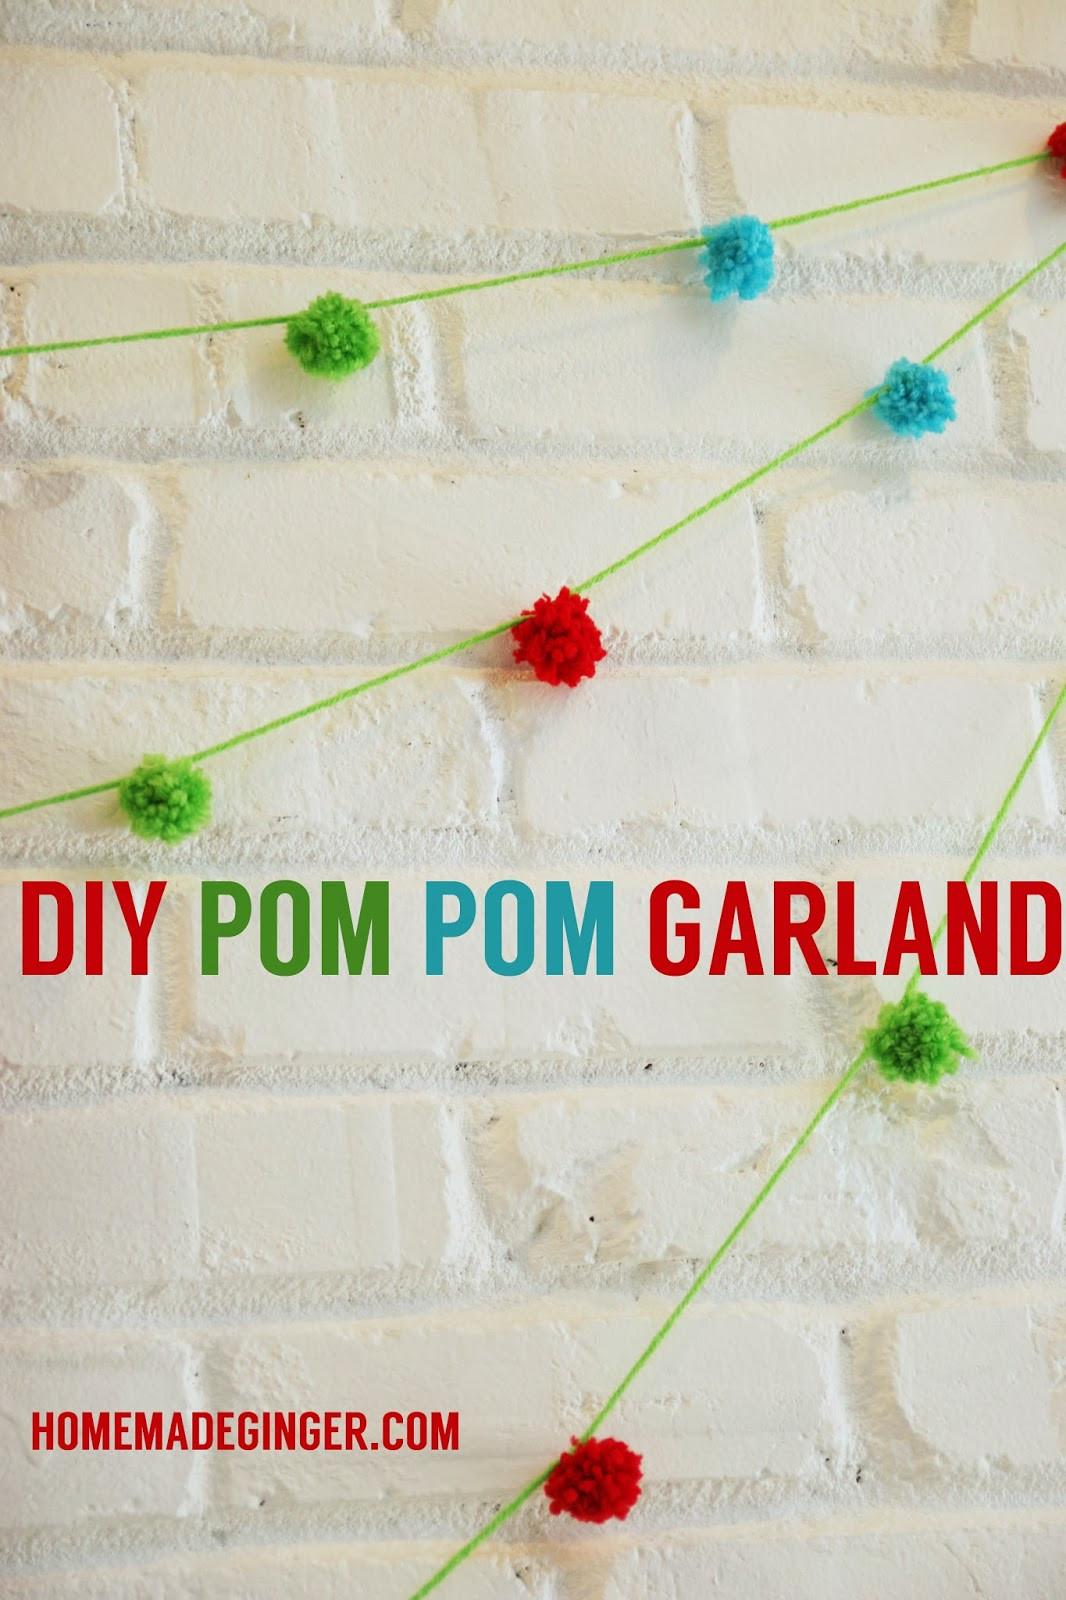 Best ideas about DIY Pom Pom Garland . Save or Pin TUTORIAL DIY Pom Pom Garland Homemade Ginger Now.